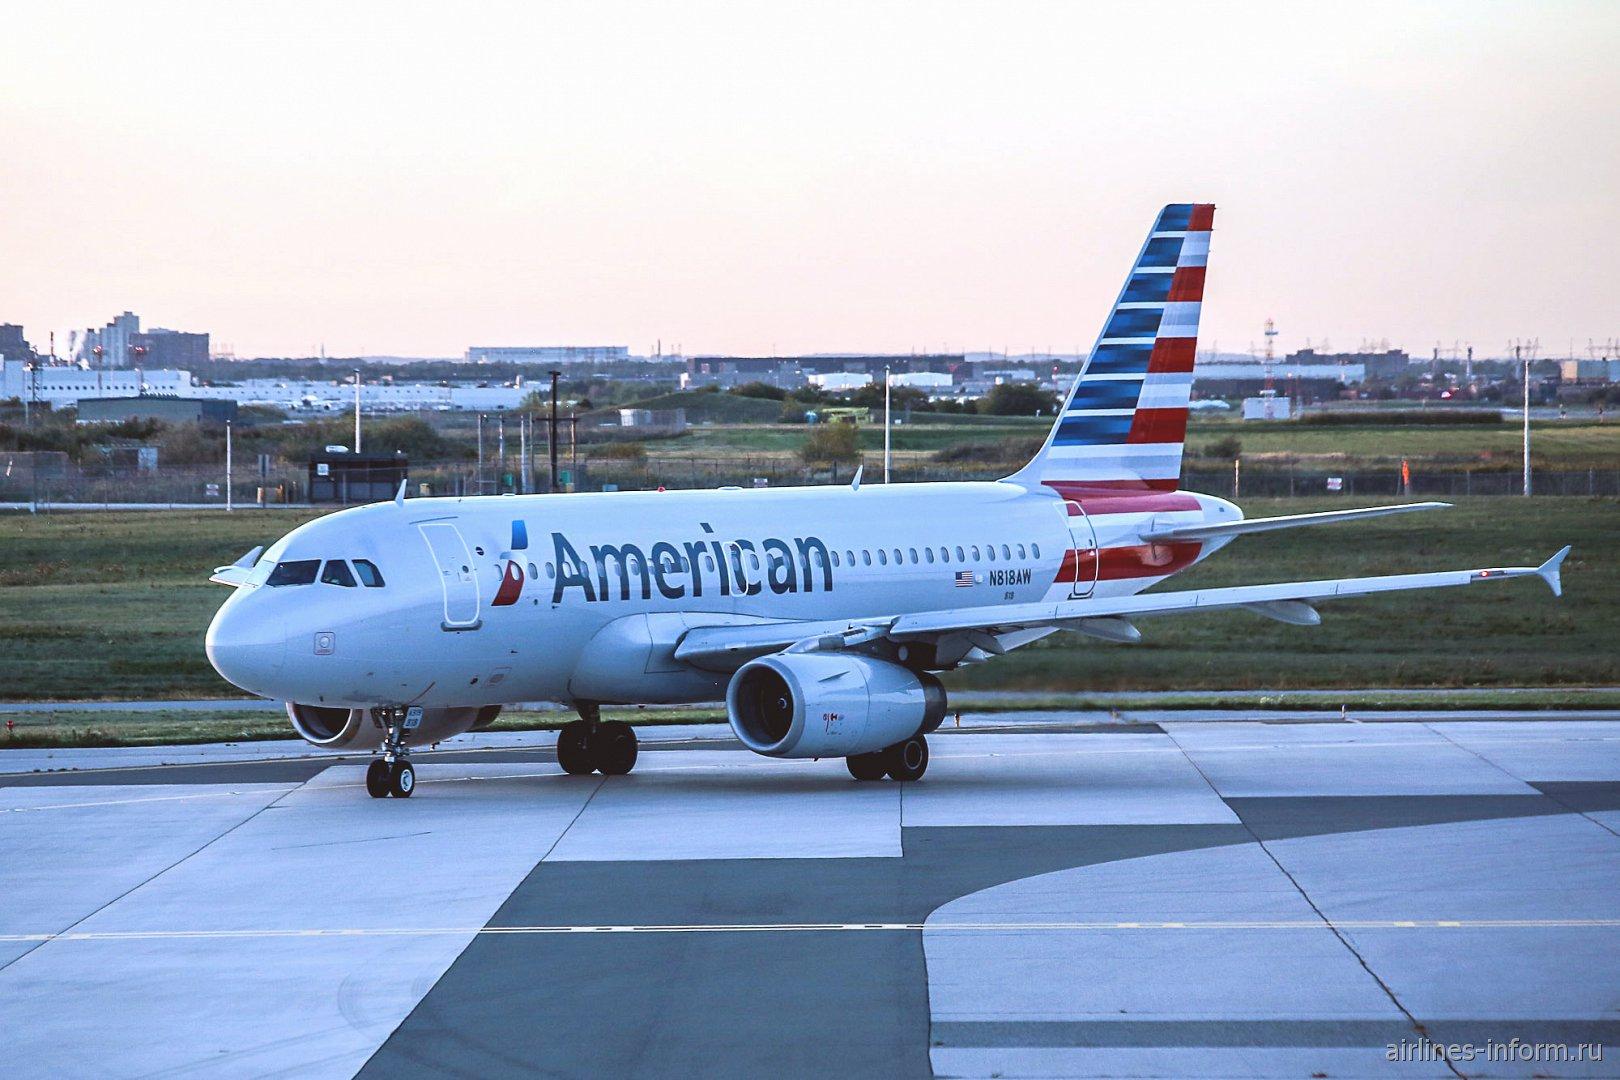 Airbus A319 N818AW Американских авиалиний в аэропорту Торонто Пирсон